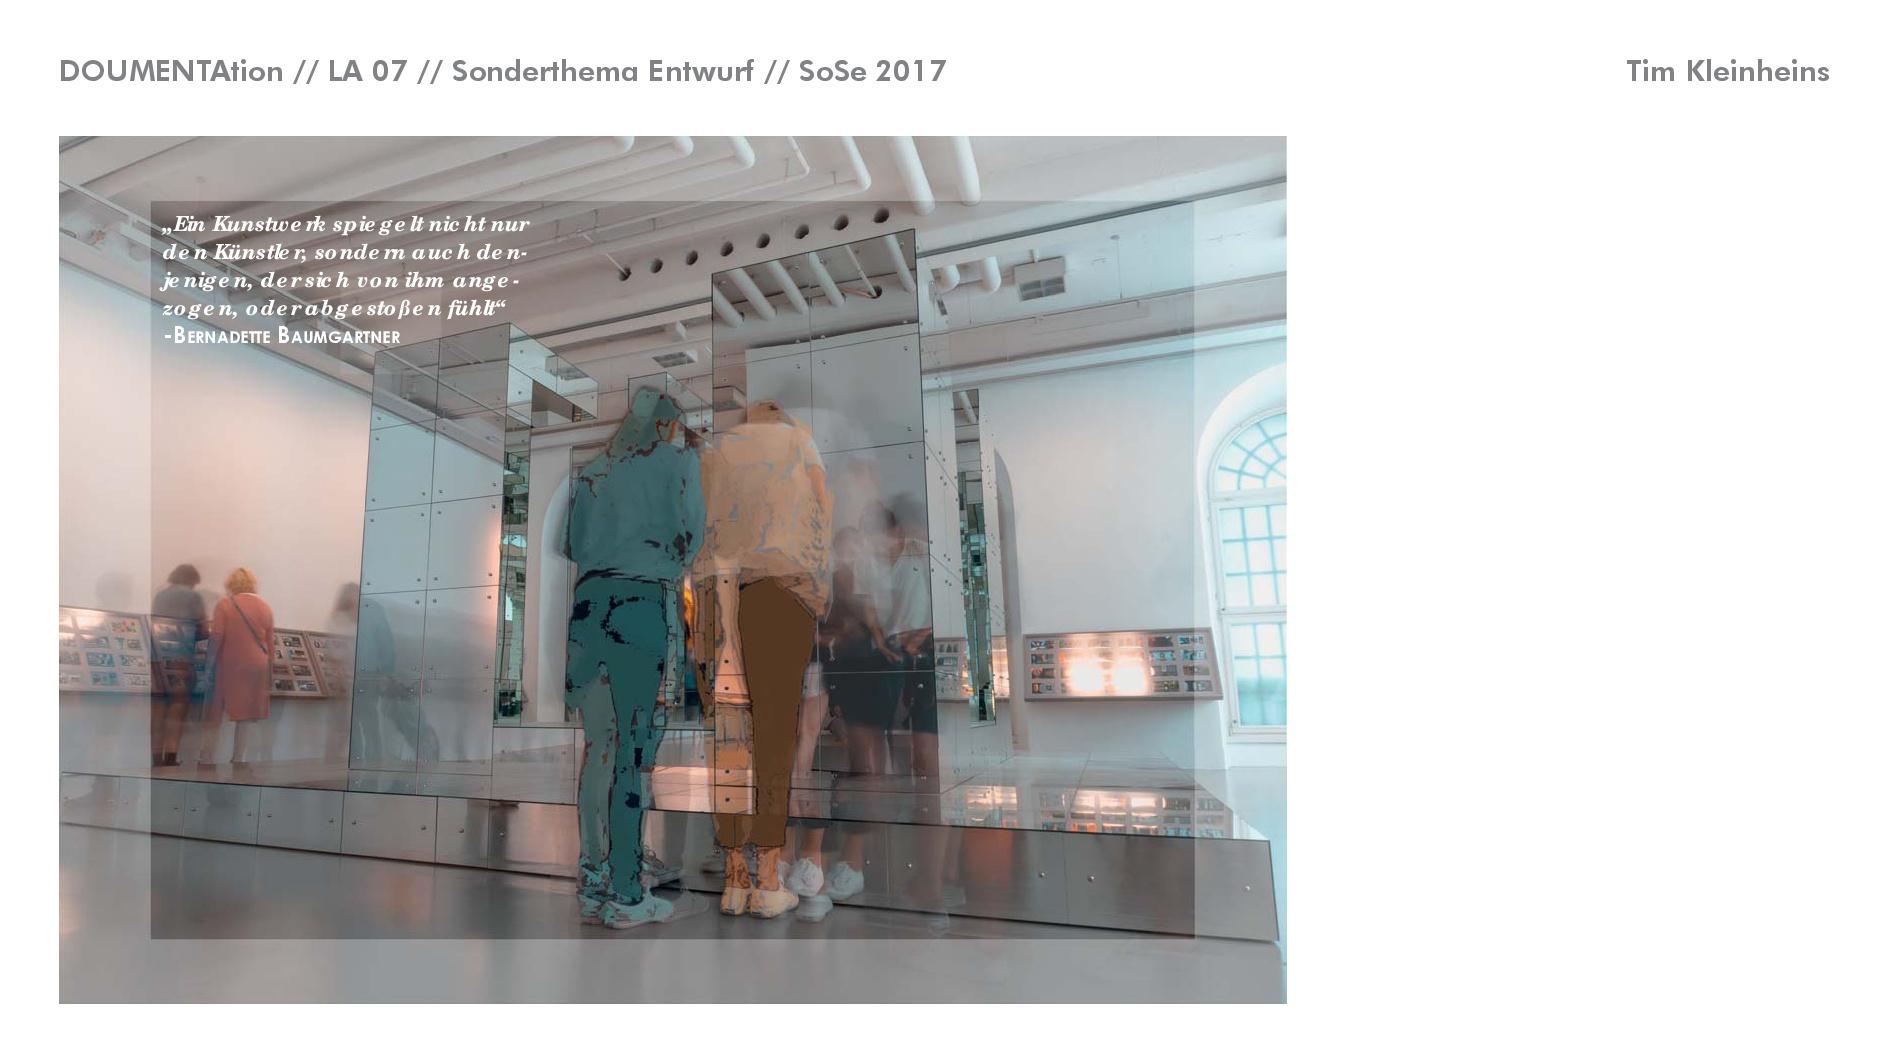 NEU Sonderthema Entwerfen SoSe 17 005